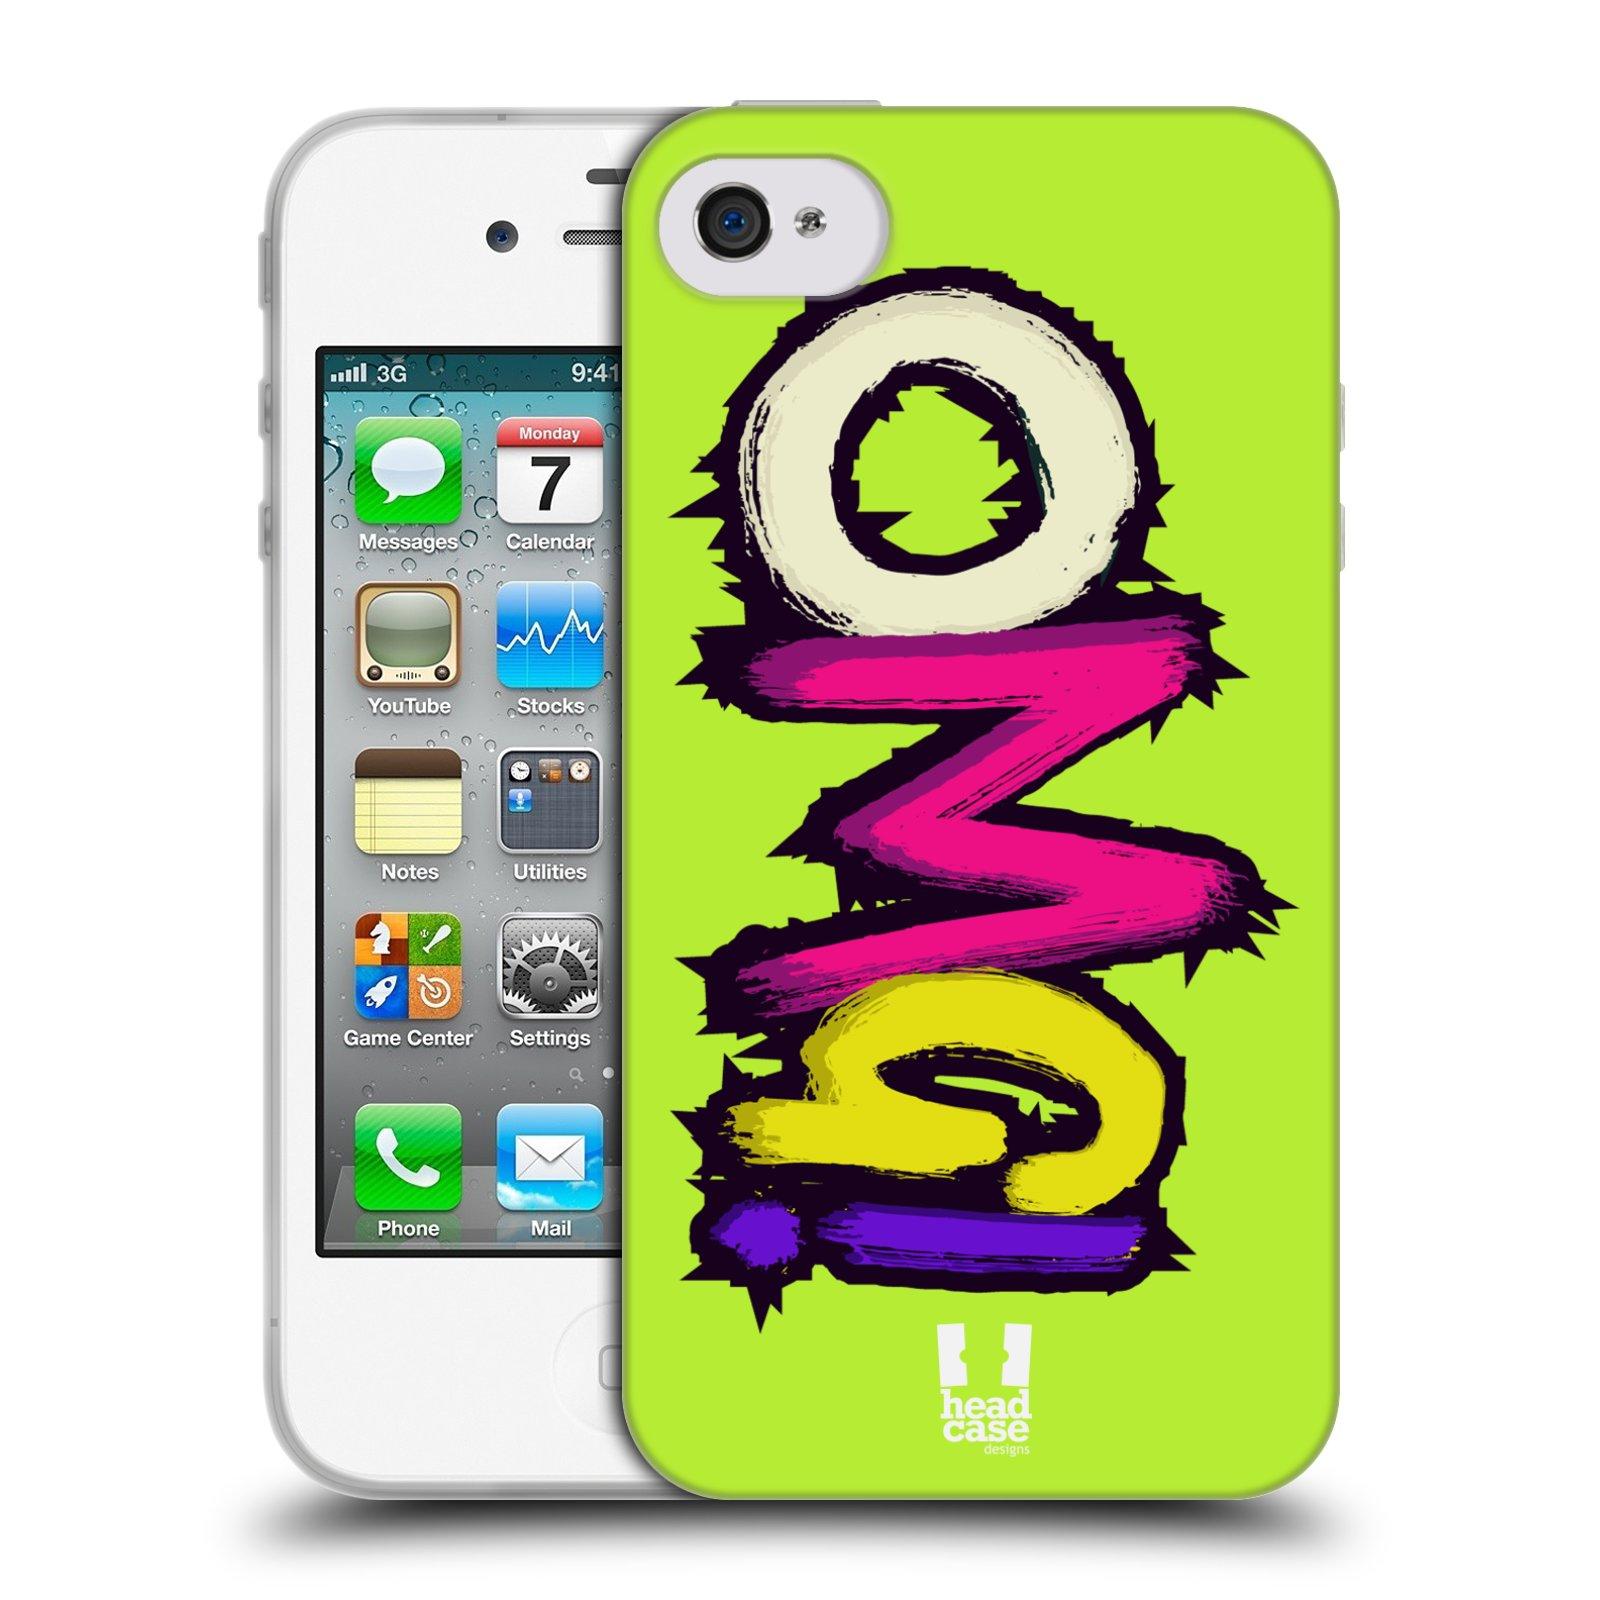 HEAD CASE silikonový obal na mobil Apple Iphone 4 4S vzor zelená OH MY GOD  (OMG) 506833046b8